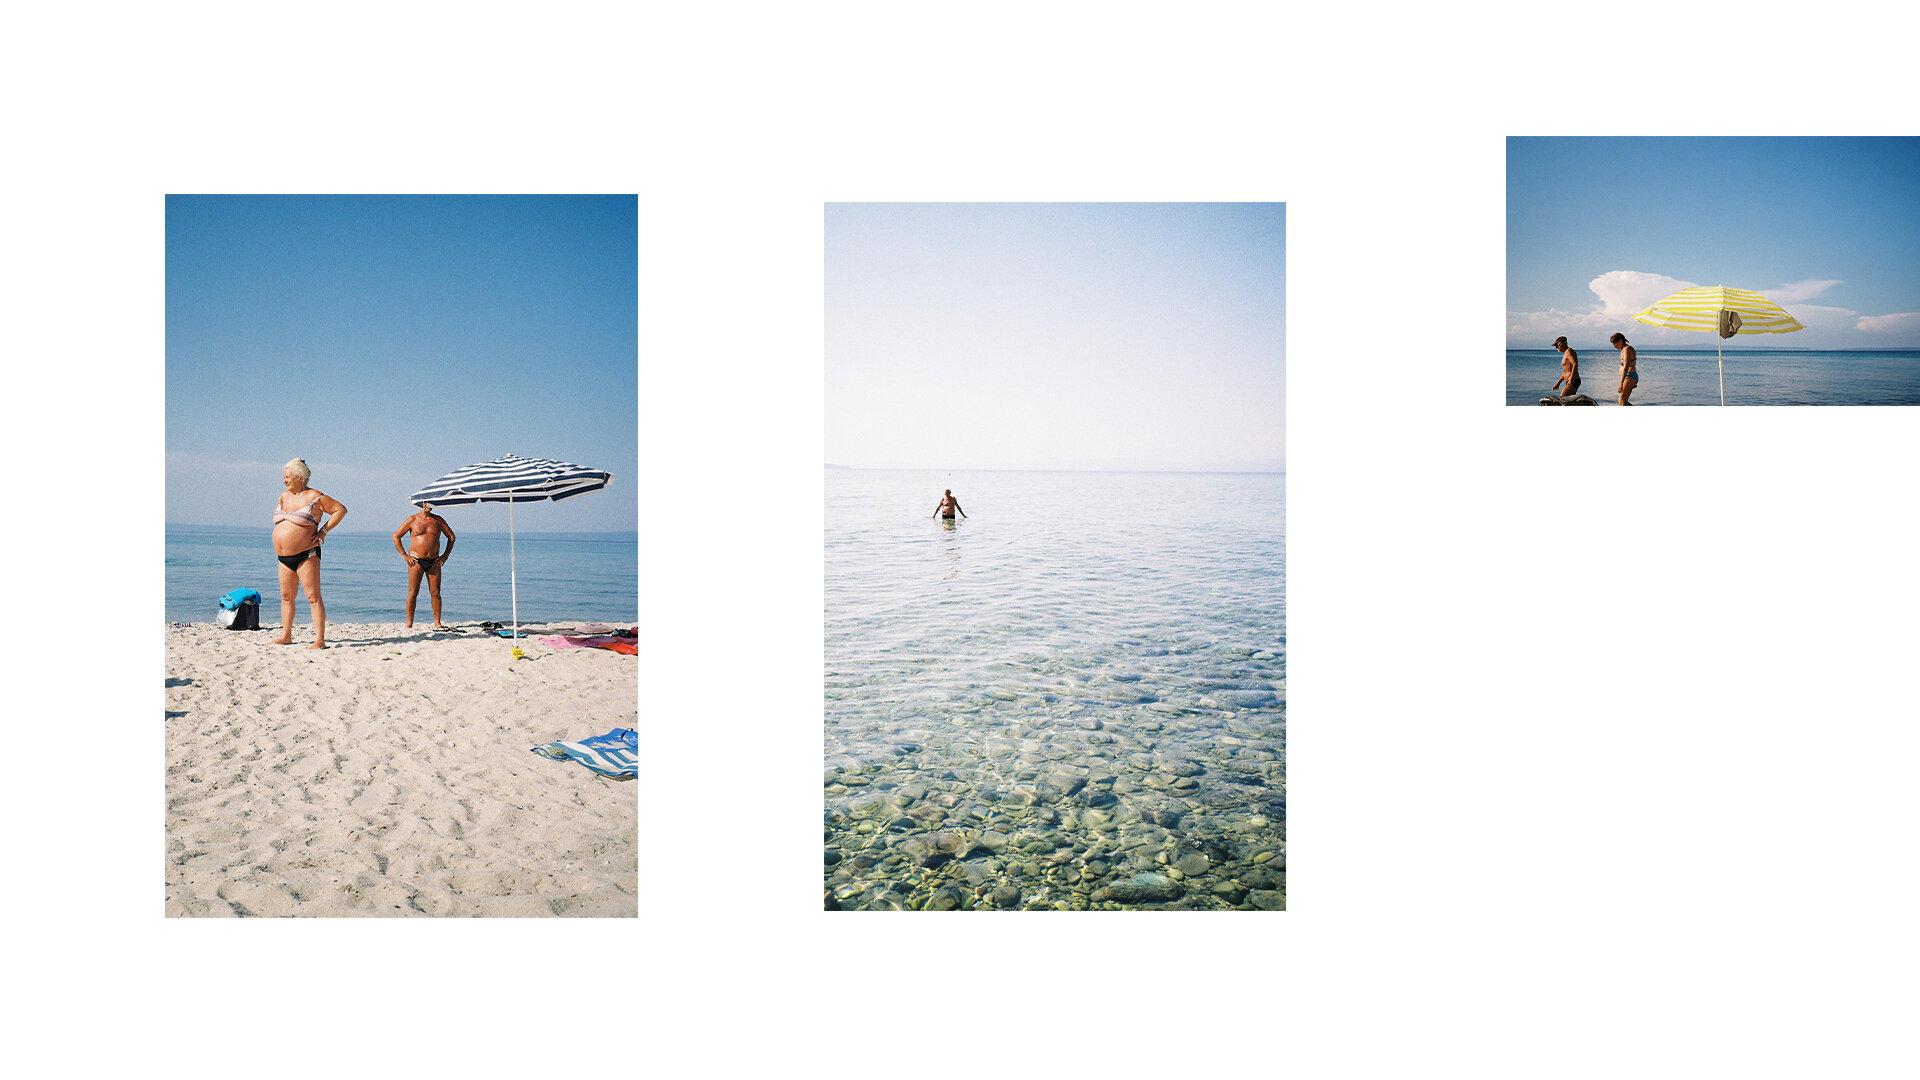 toby-butler-photo-tobybutlerphoto-lifestylephotography-travel-travelphotography-lifestyle-tourism-greece-film-35mm-magazine-europe-mediterranean-ocean-4.jpg